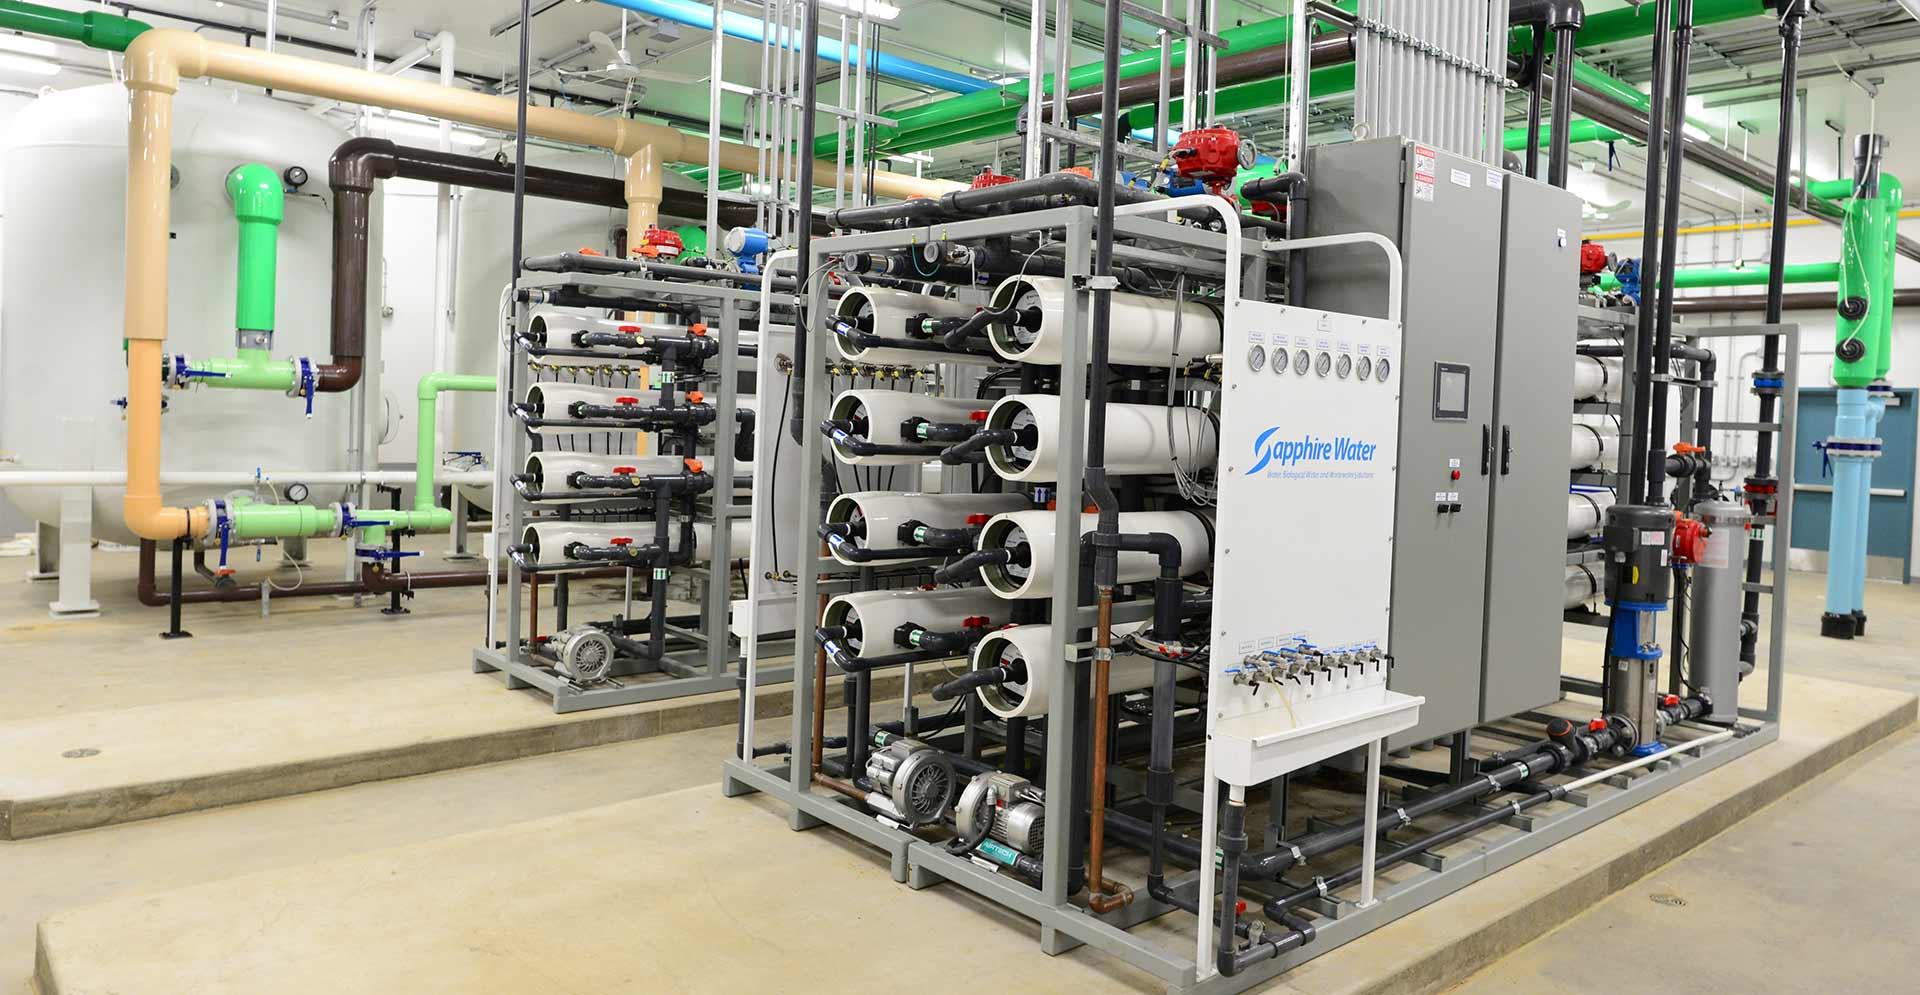 Image of a bioreactor